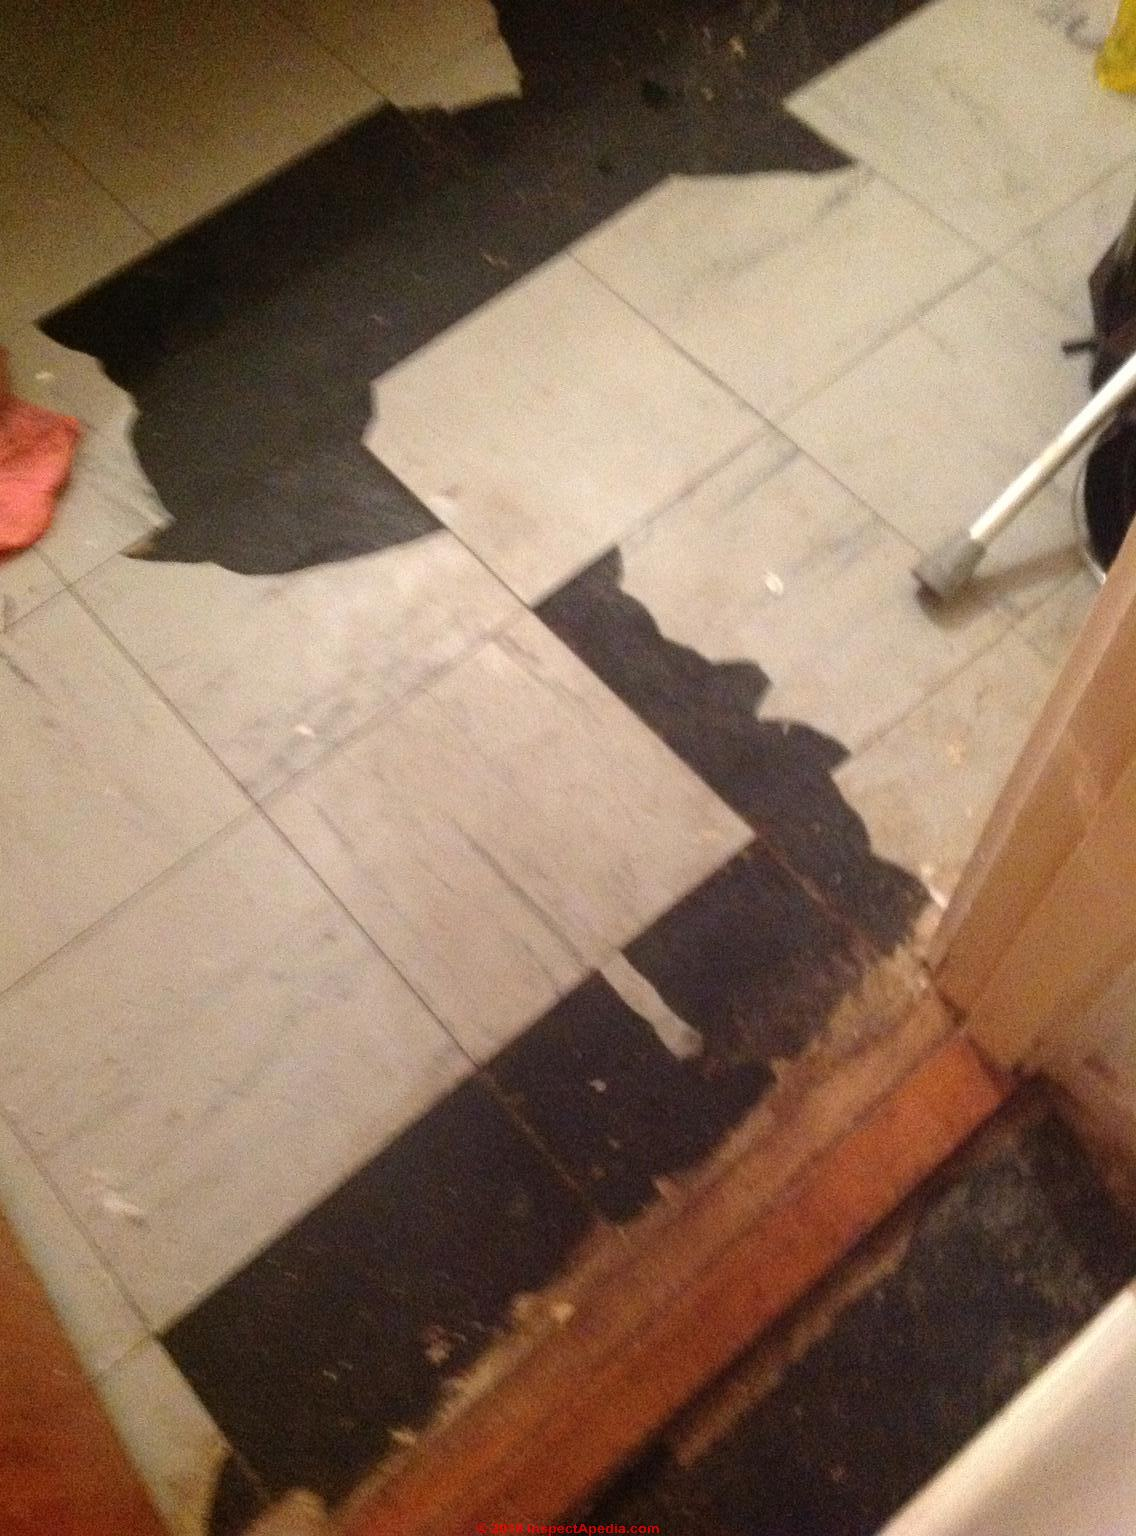 Asbestos floor tile Southend by Sea UK Beresford Rd. (C) Inspectapedia.com